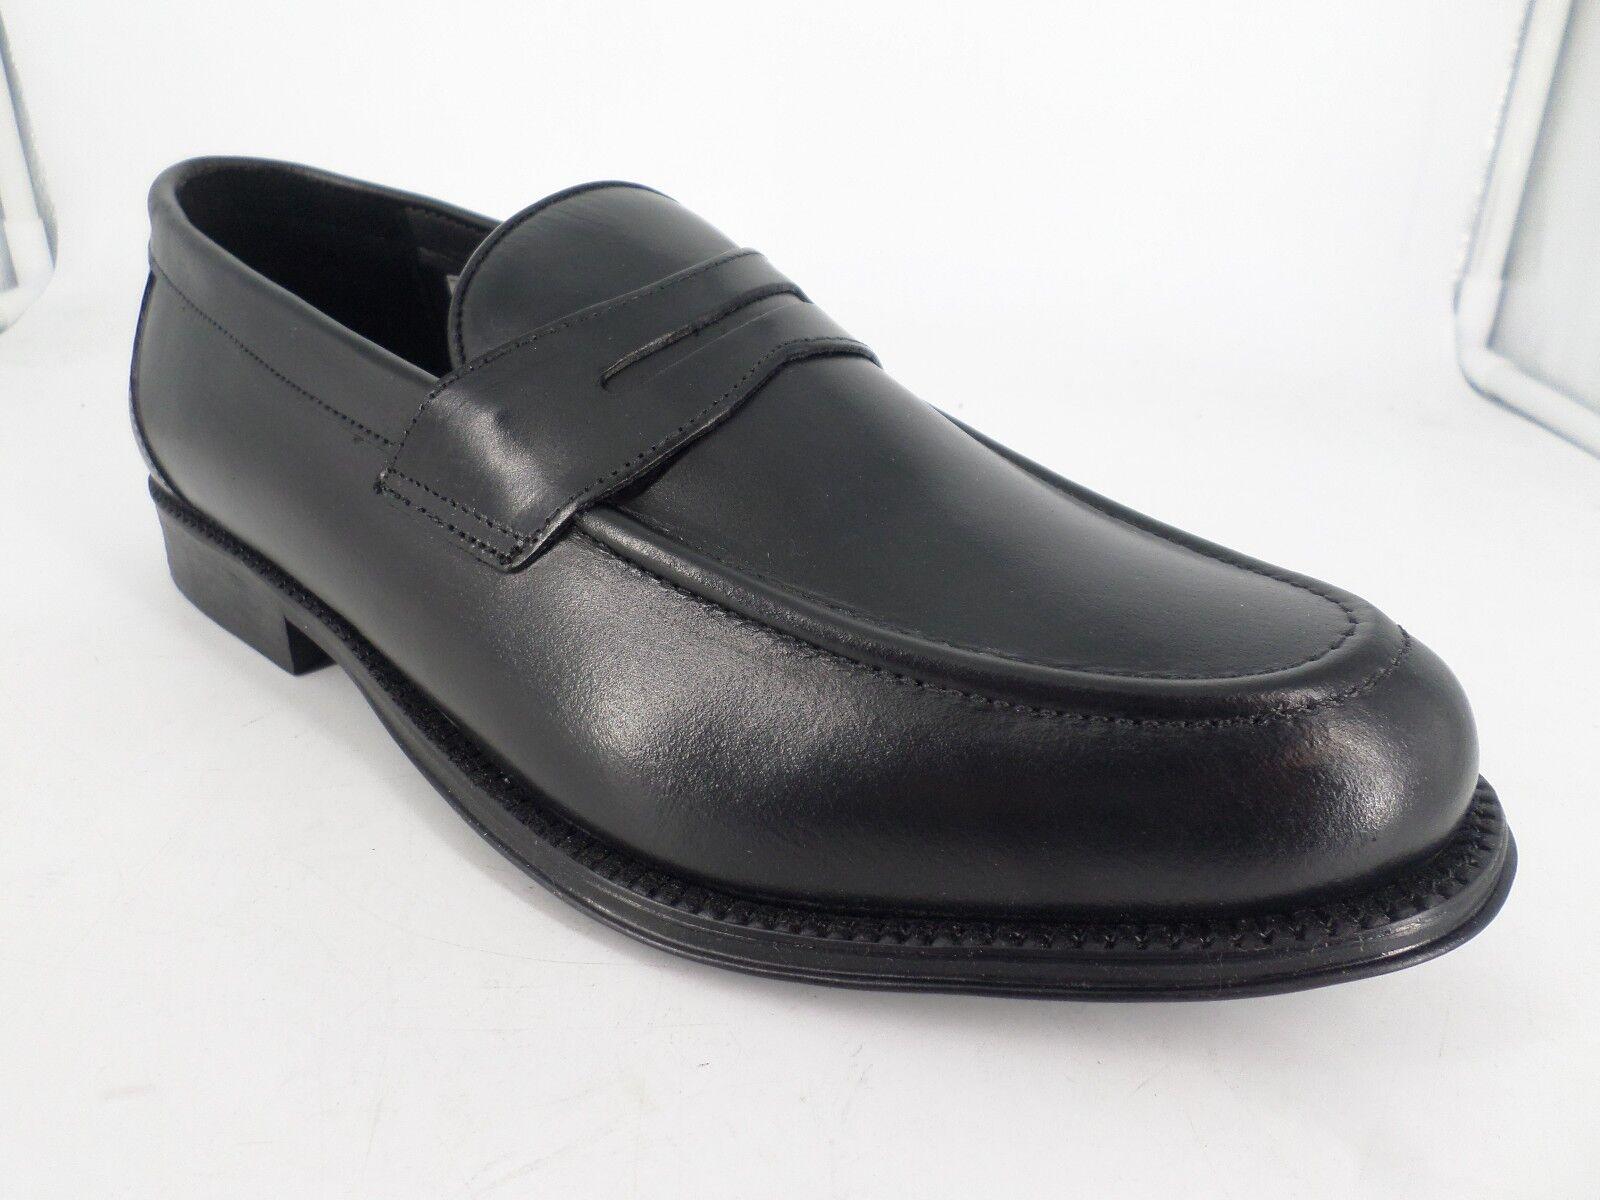 Clifford James Penny Loafer Men's Real Leather shoes JS39 98 SALEx